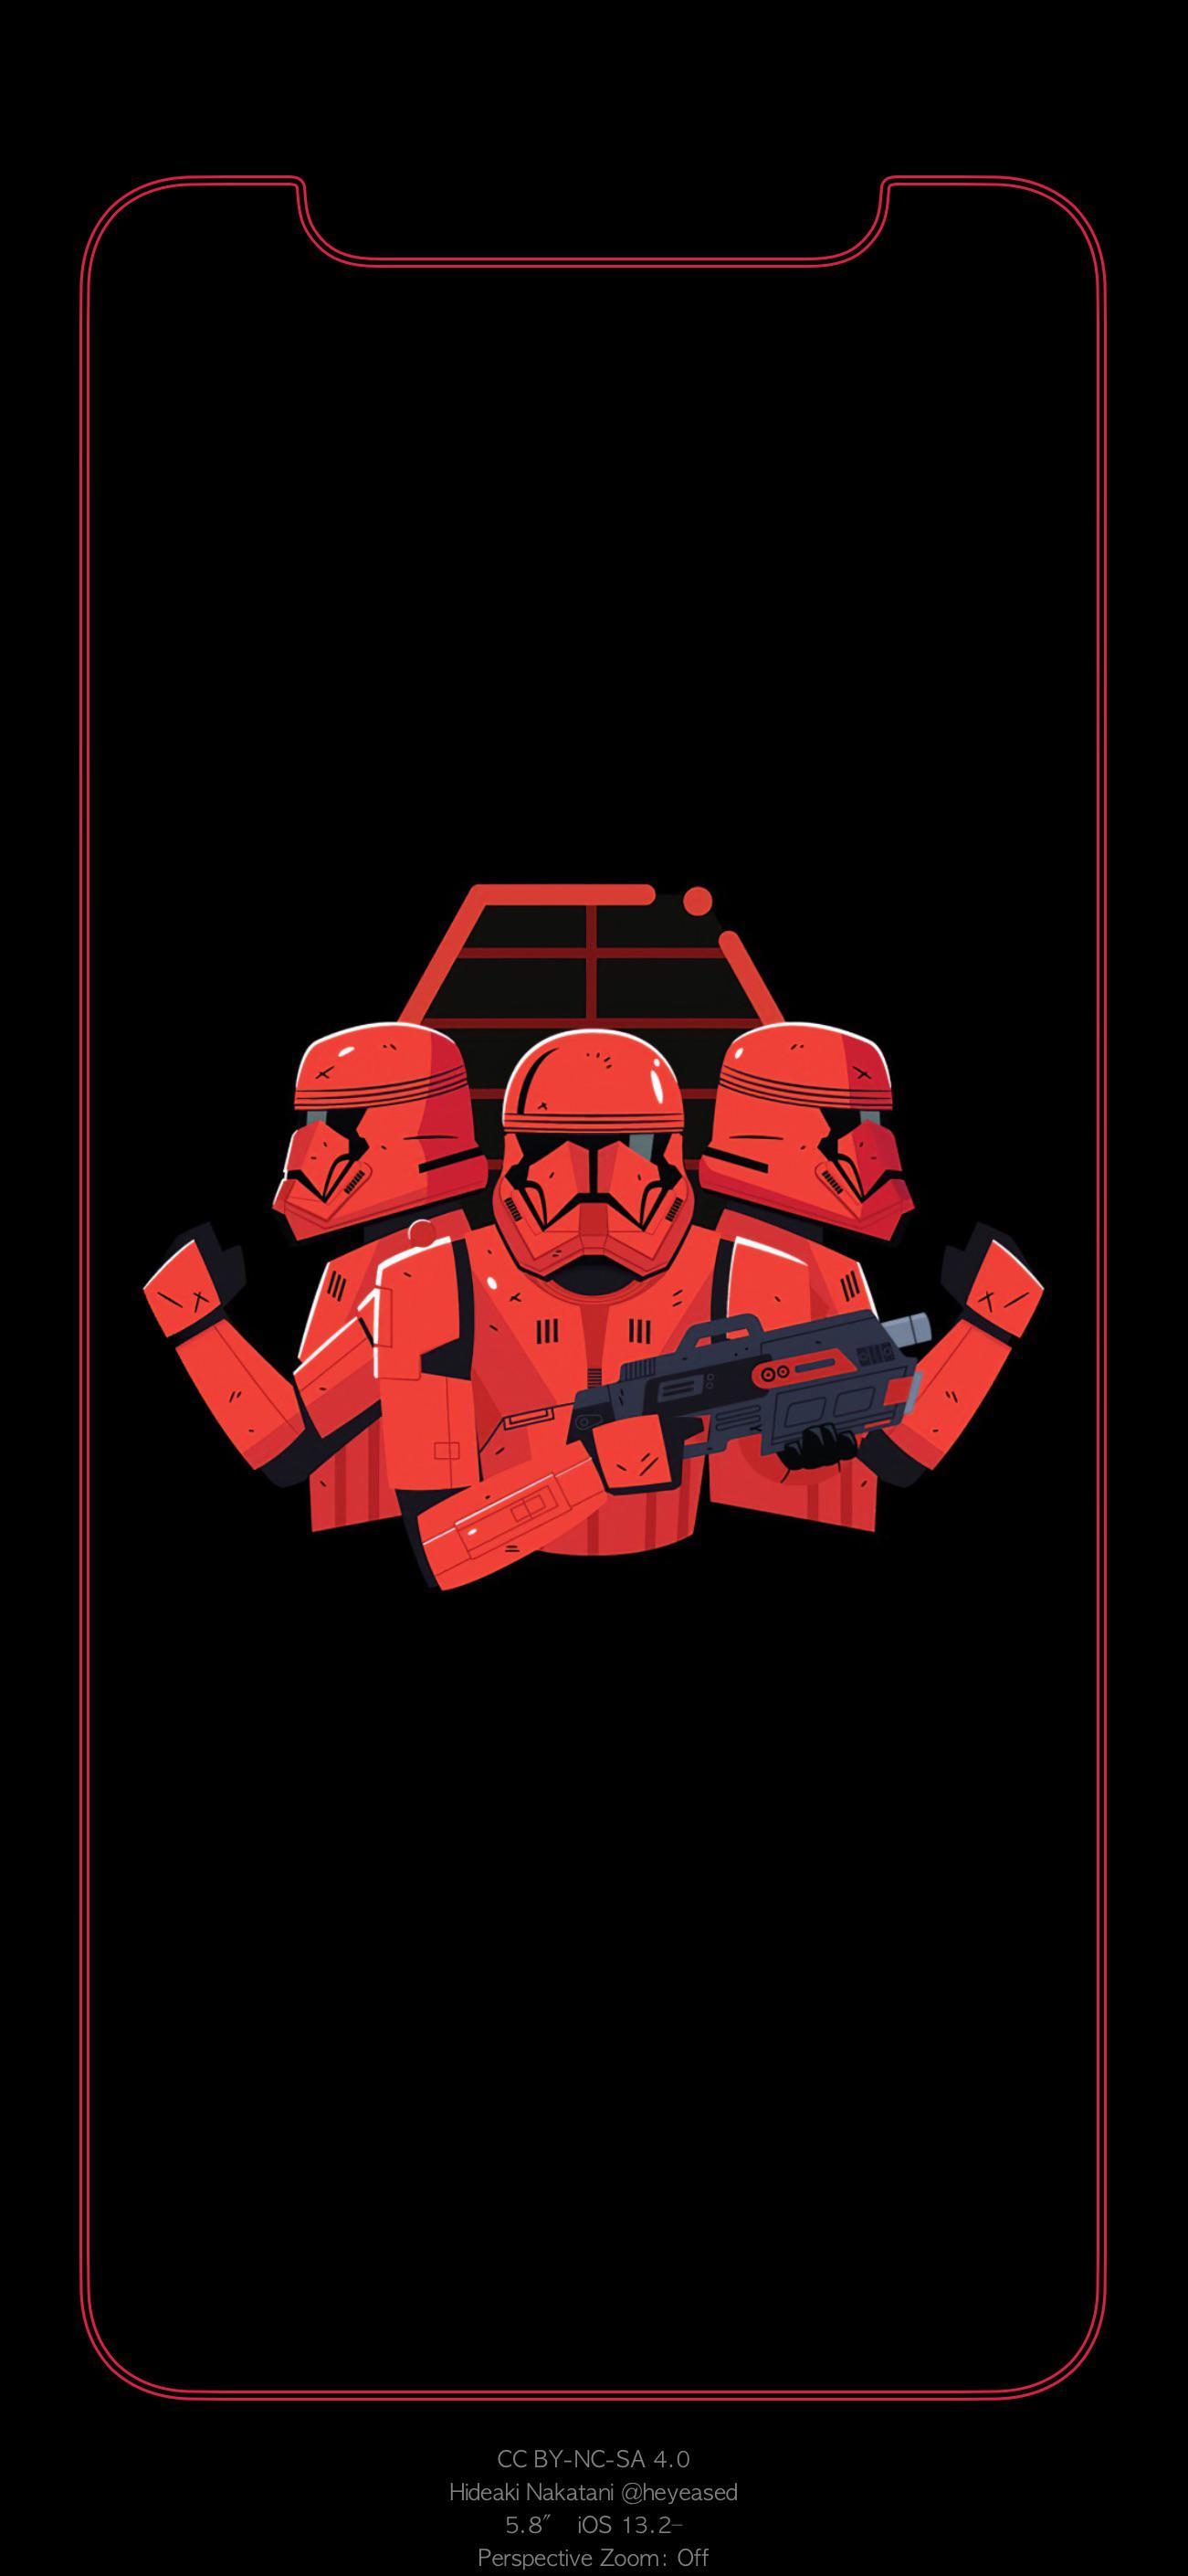 Star Wars Wallpaper Border 1301x2820 Download Hd Wallpaper Wallpapertip